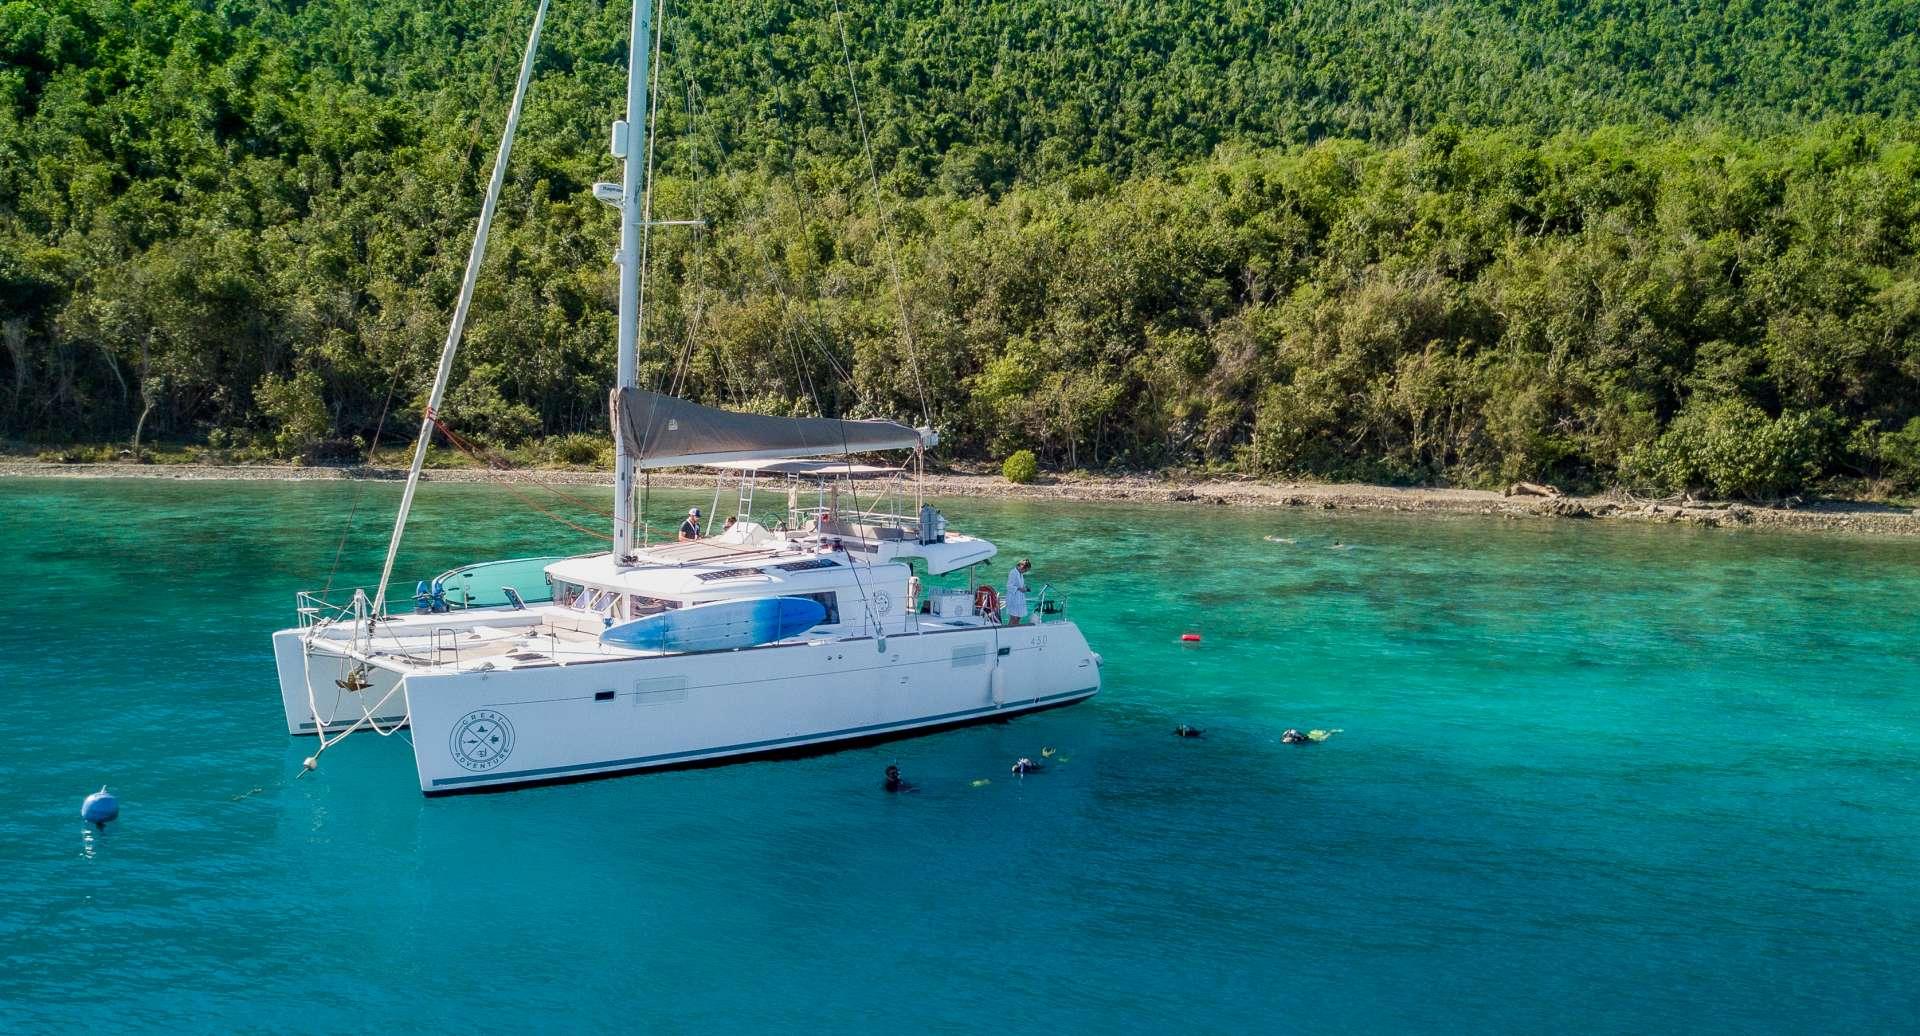 Main image of GREAT ADVENTURE yacht